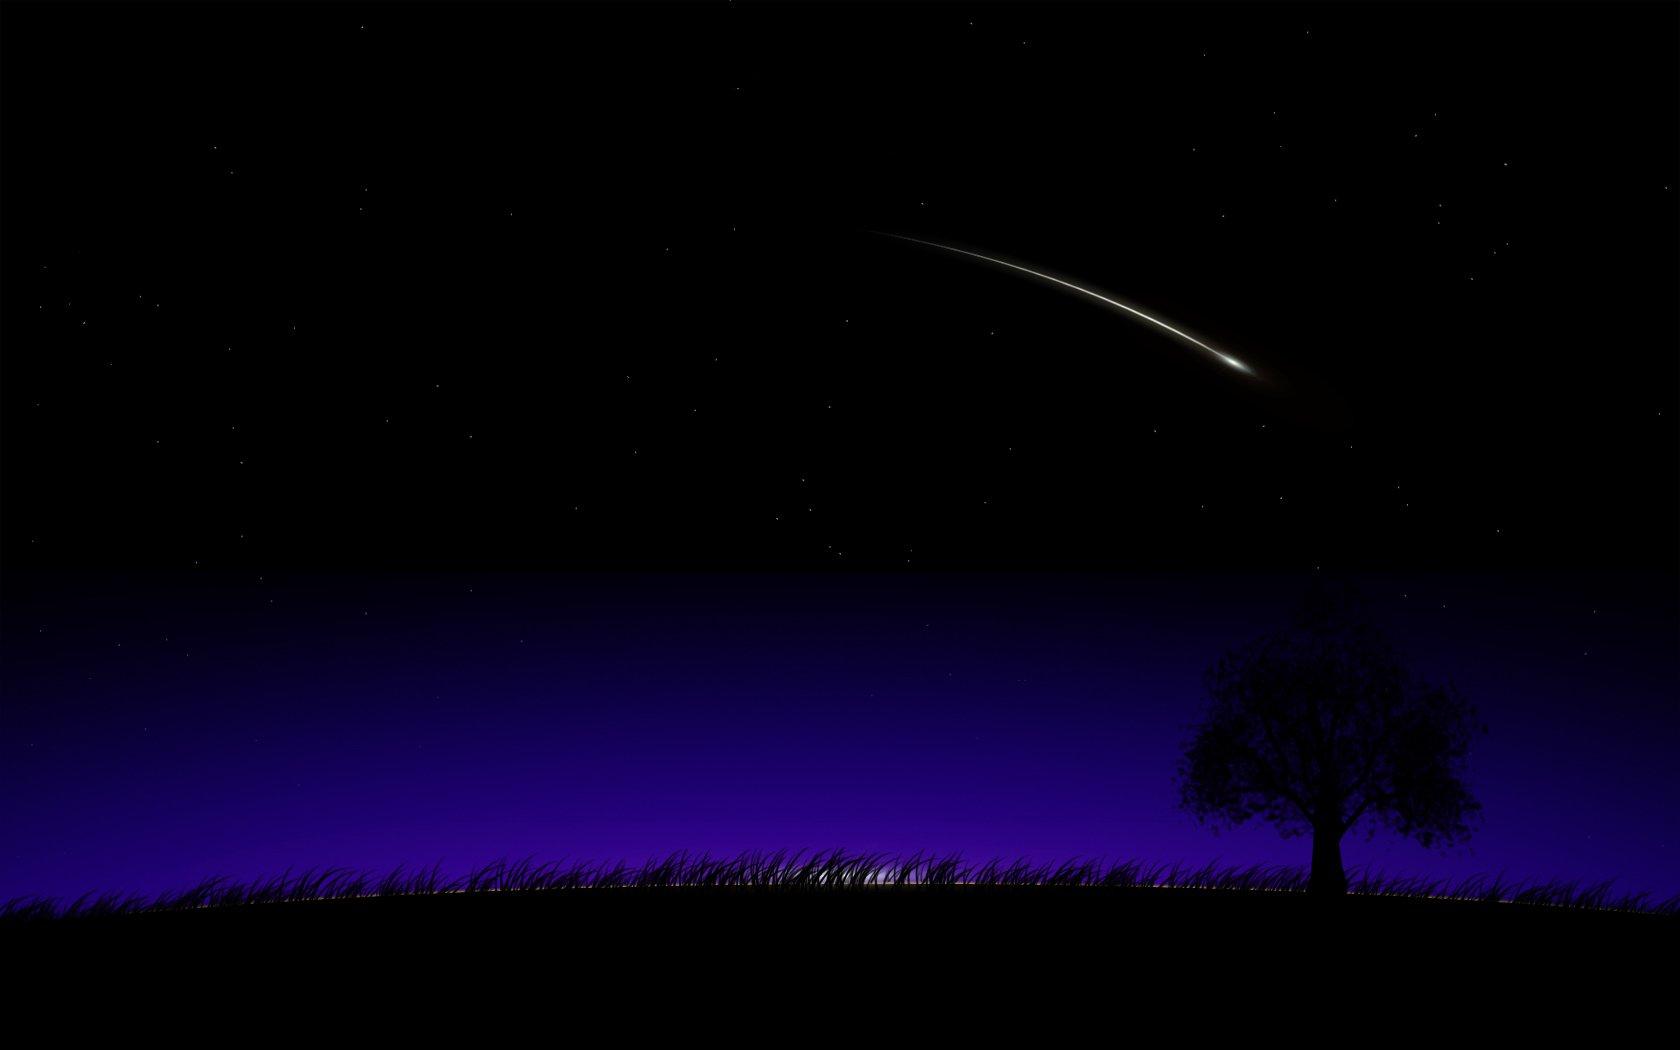 Night shooting star wallpaper 1680x1050 324328 WallpaperUP 1680x1050